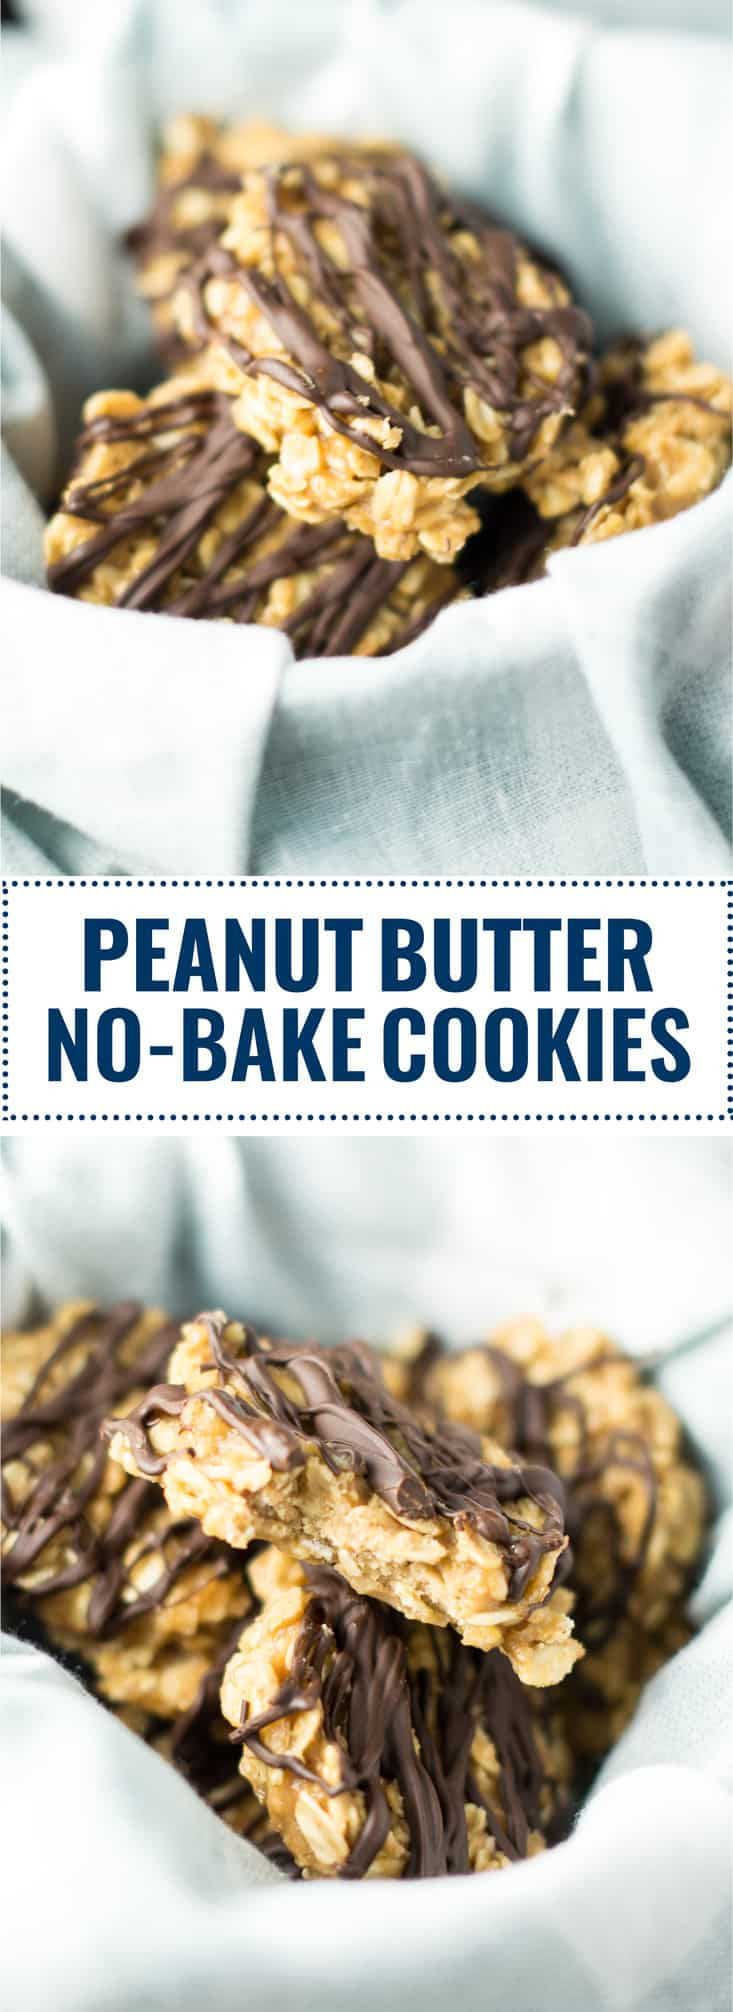 Healthy Peanut Butter No Bake Cookies  Healthy Peanut Butter No Bake Cookies Recipe vegan